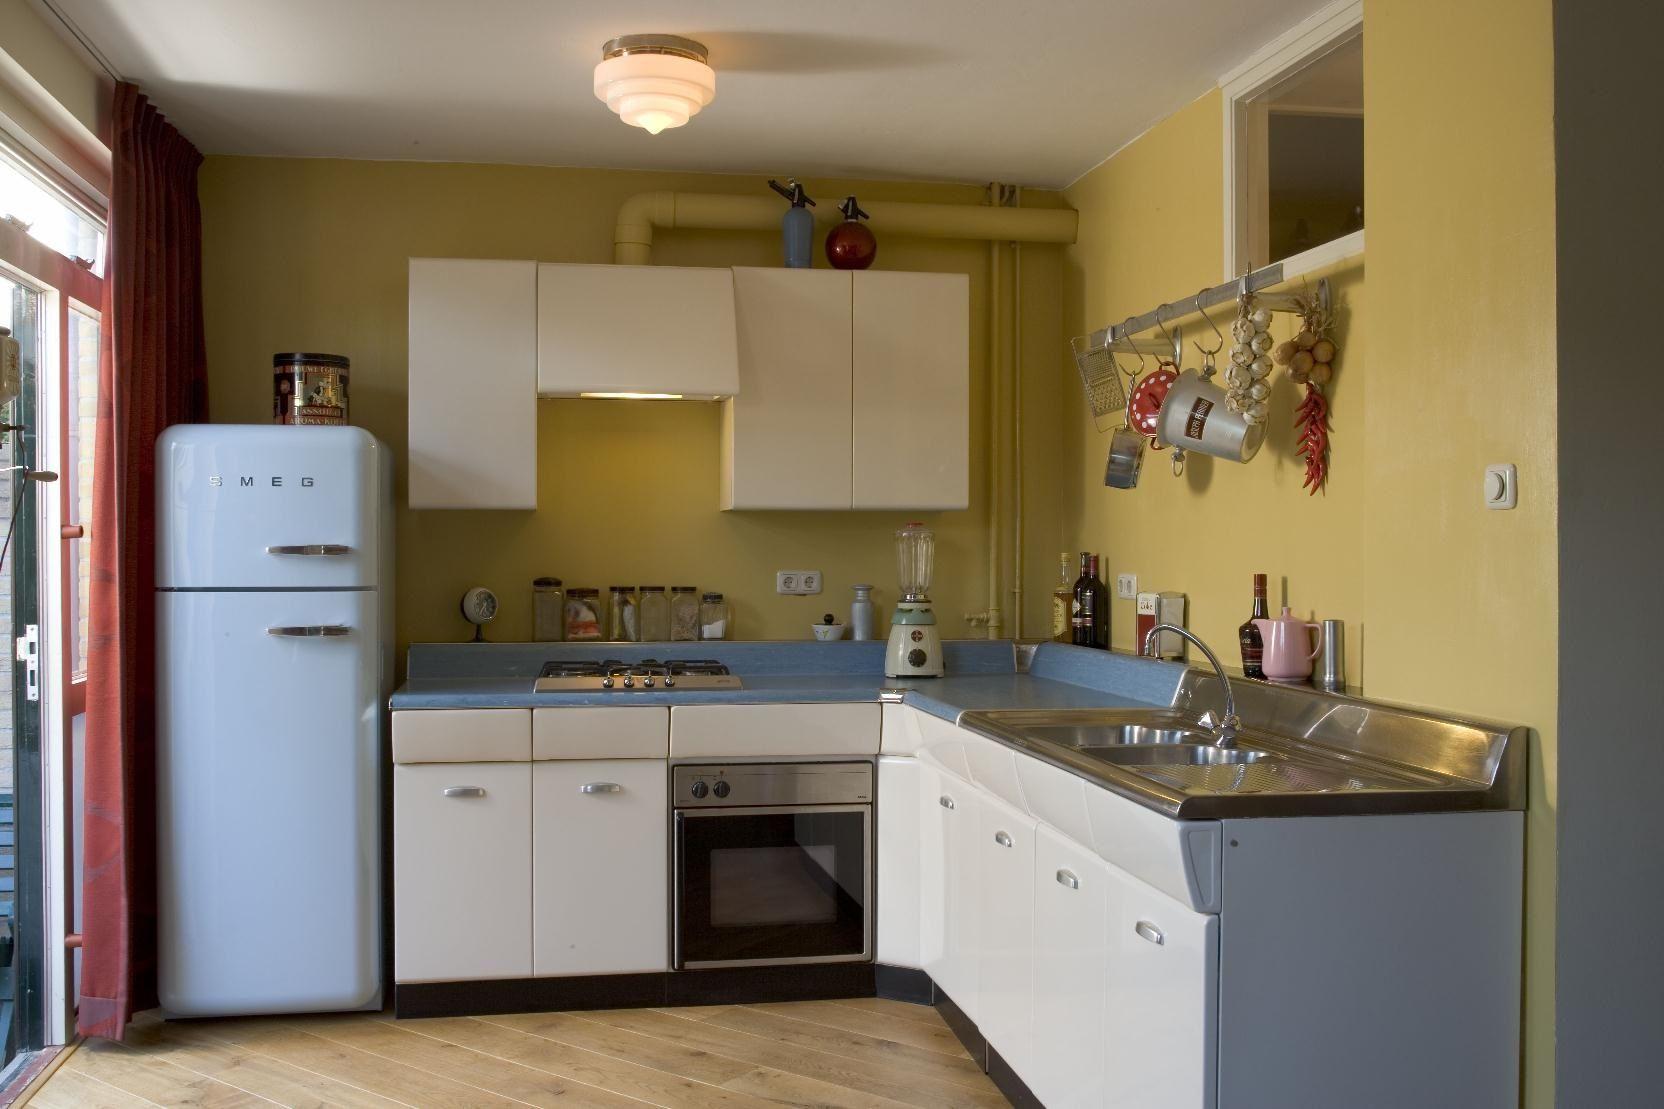 Retro keuken idfix bcl met smeg koelkast american - American kitchen designs in egypt ...